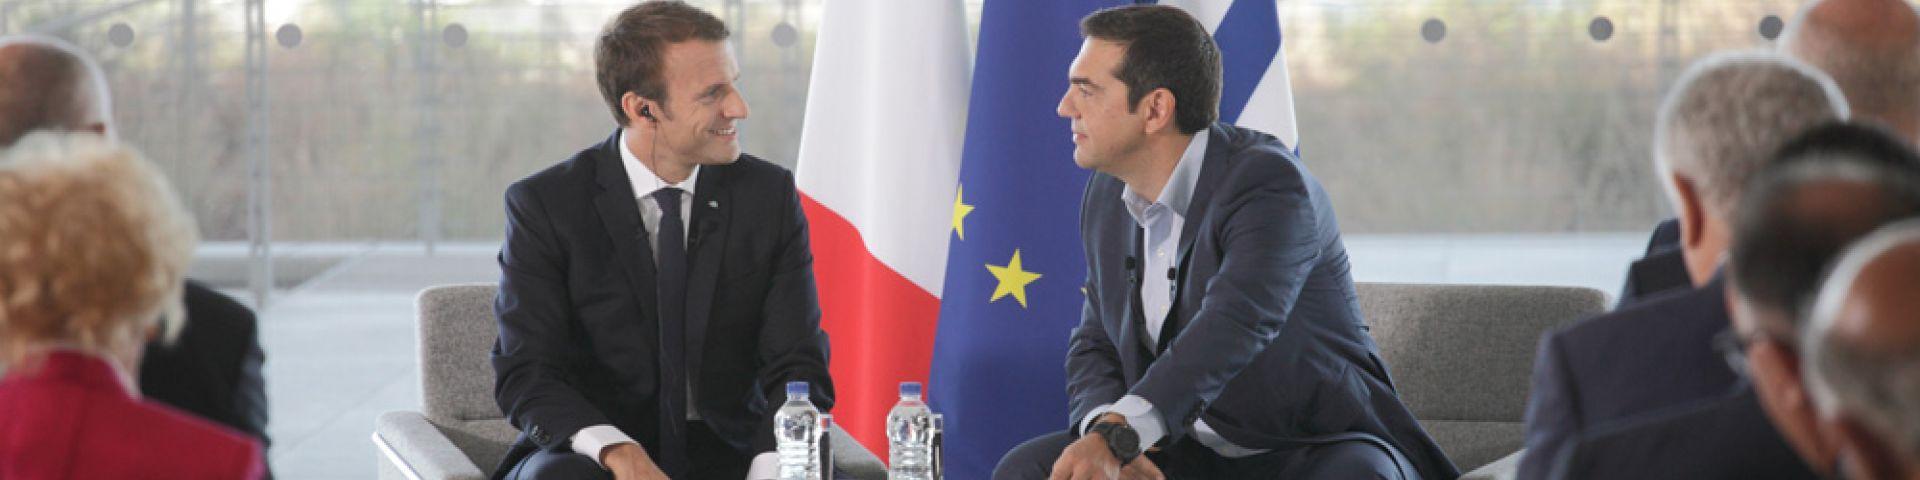 Emmanuel Macron: Το Κέντρο Πολιτισμού Ίδρυμα Σταύρος Νιάρχος «σύμβολο μιας νέας ελληνικής φιλοδοξίας» - Εικόνα